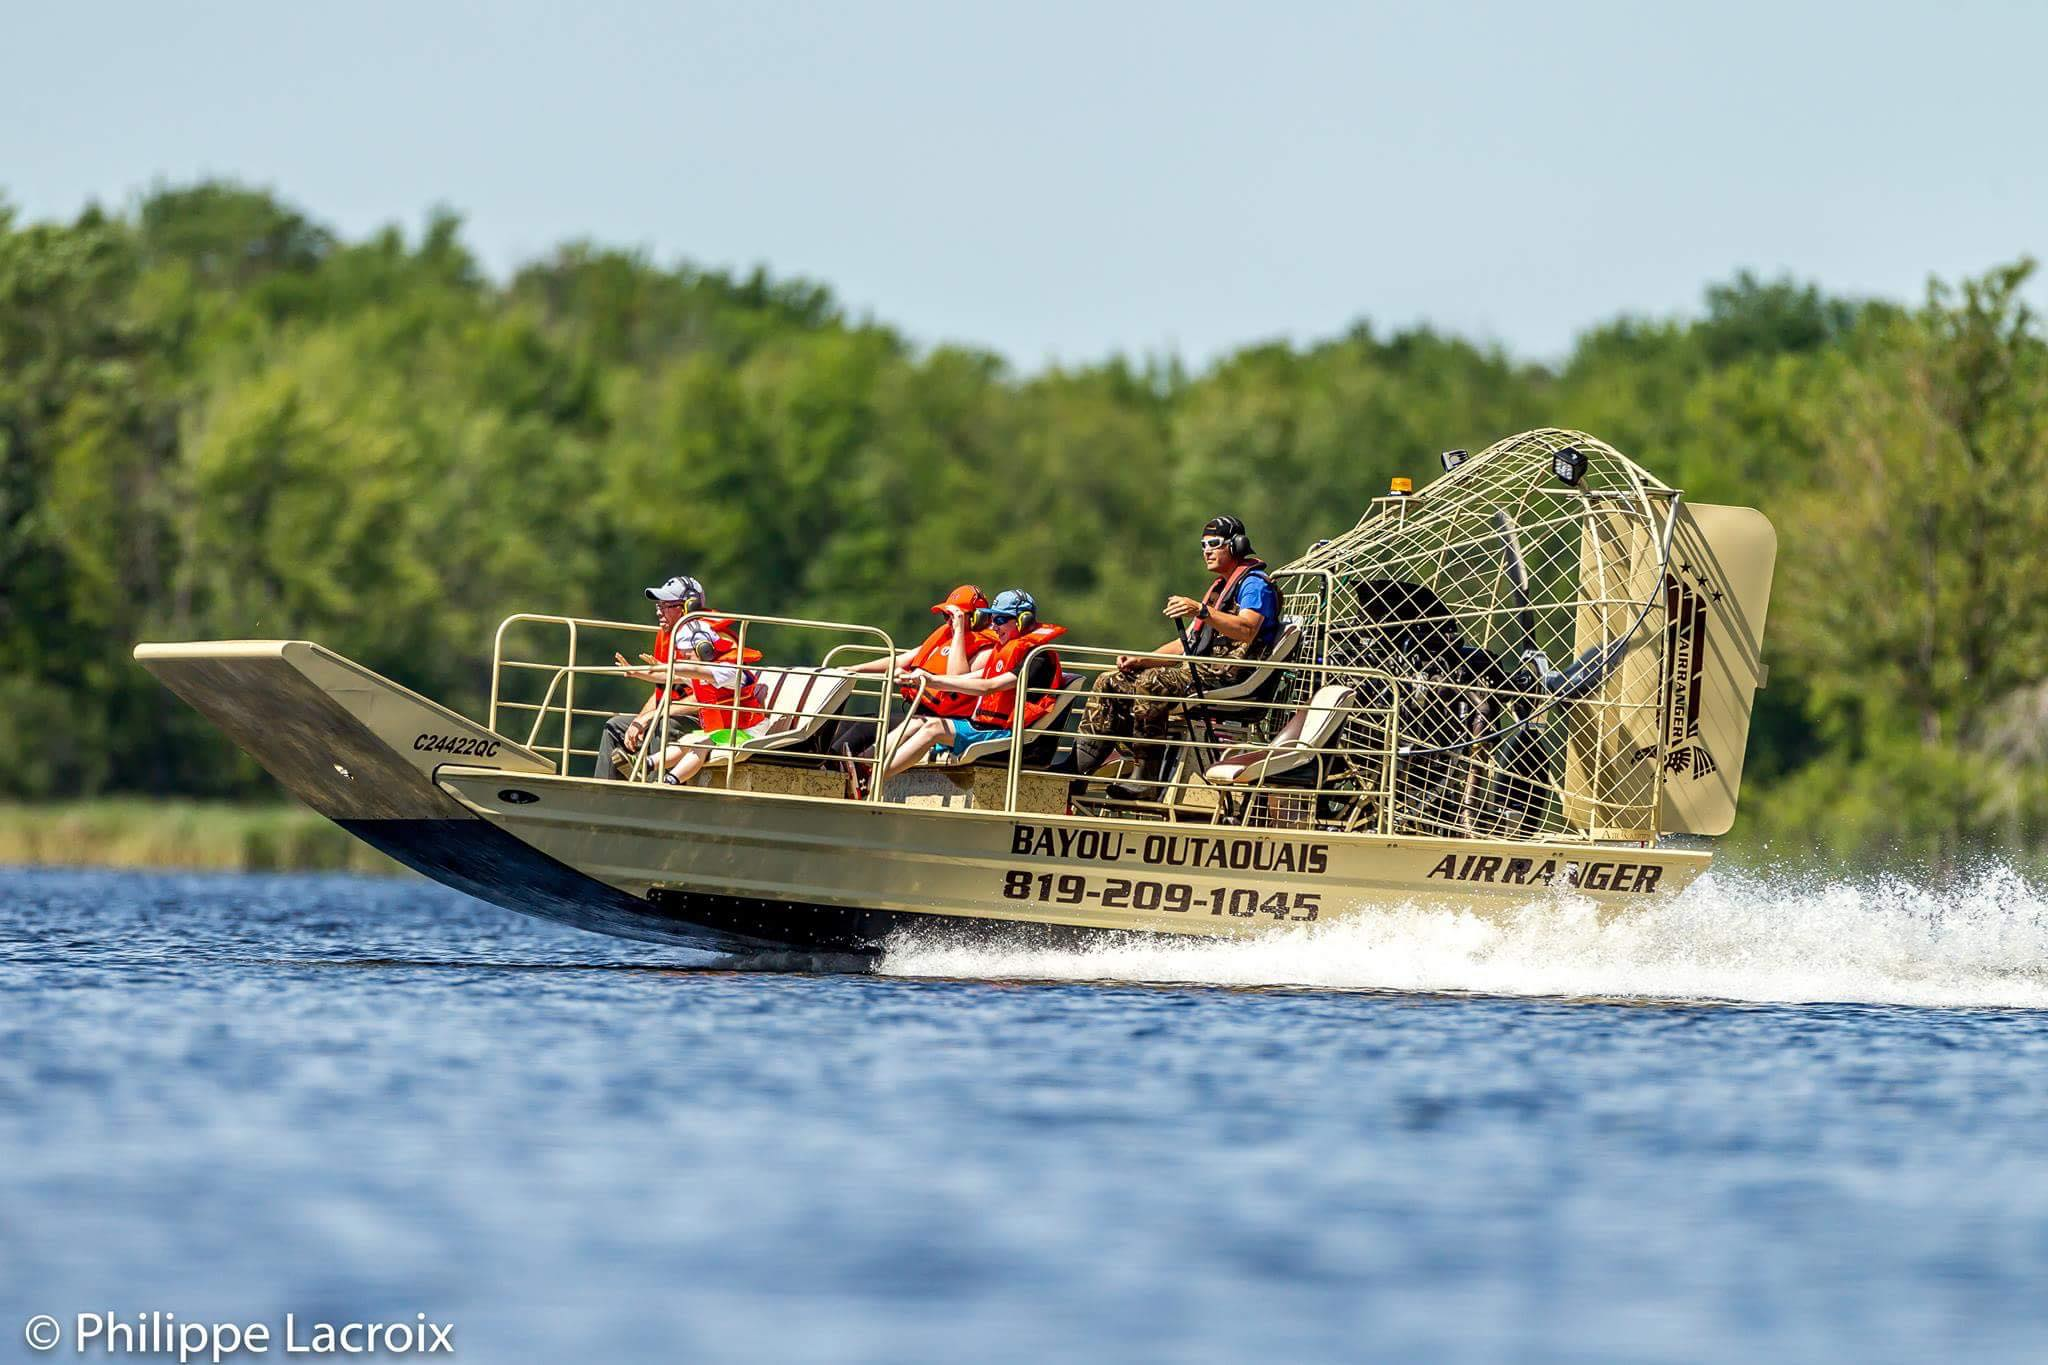 Bayou outaouais ottawa gatineau boat tours québec